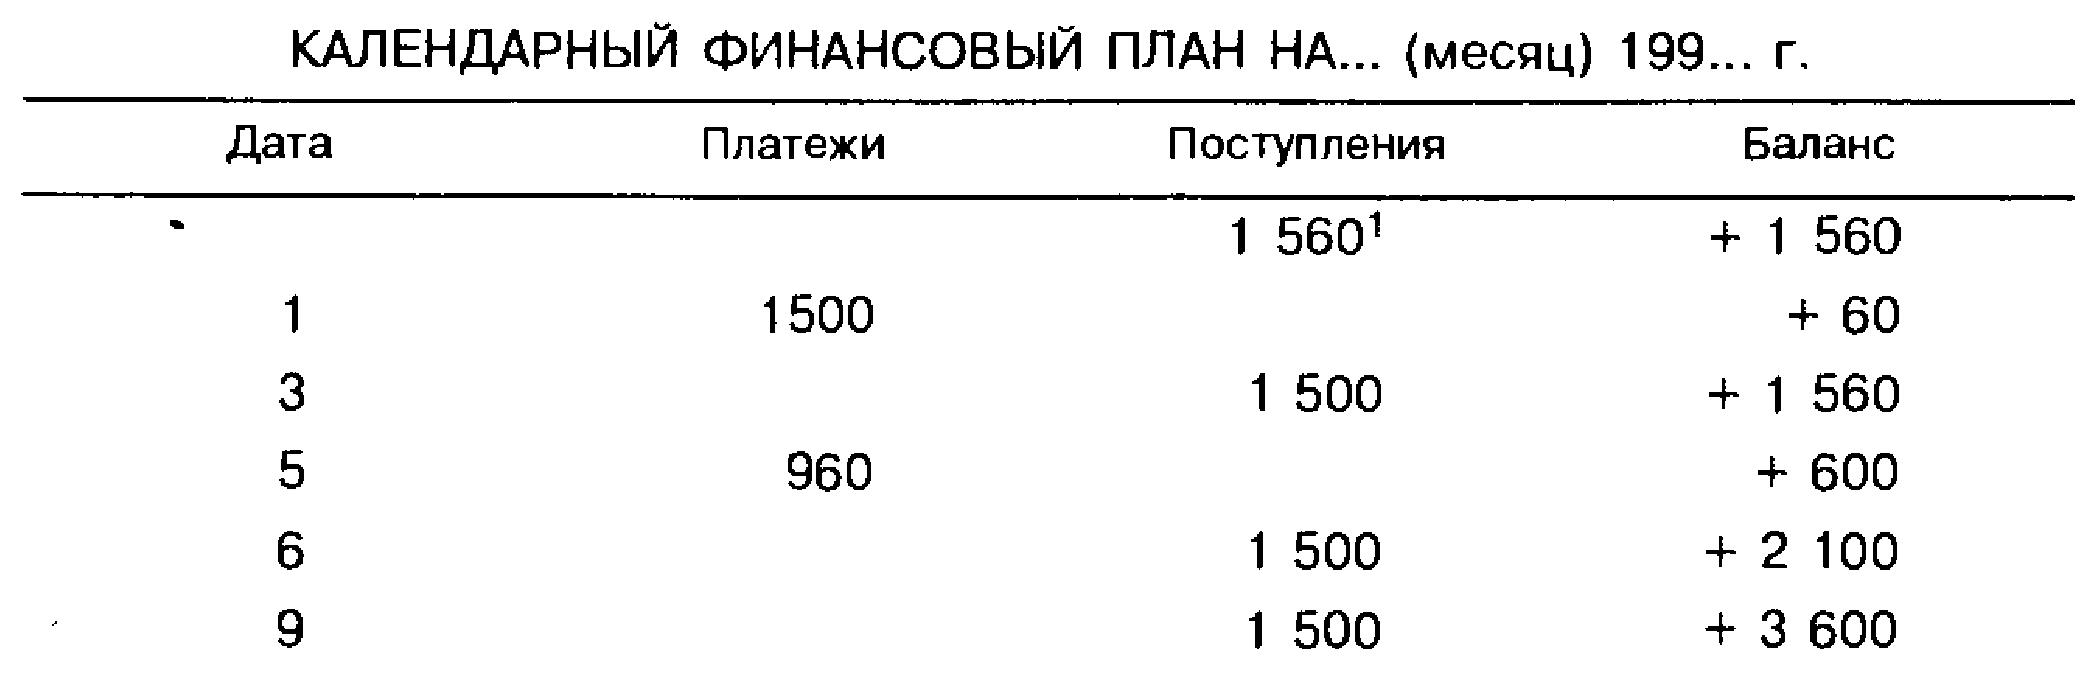 Календарный финансовый план на... (месяц) 199... г. 1